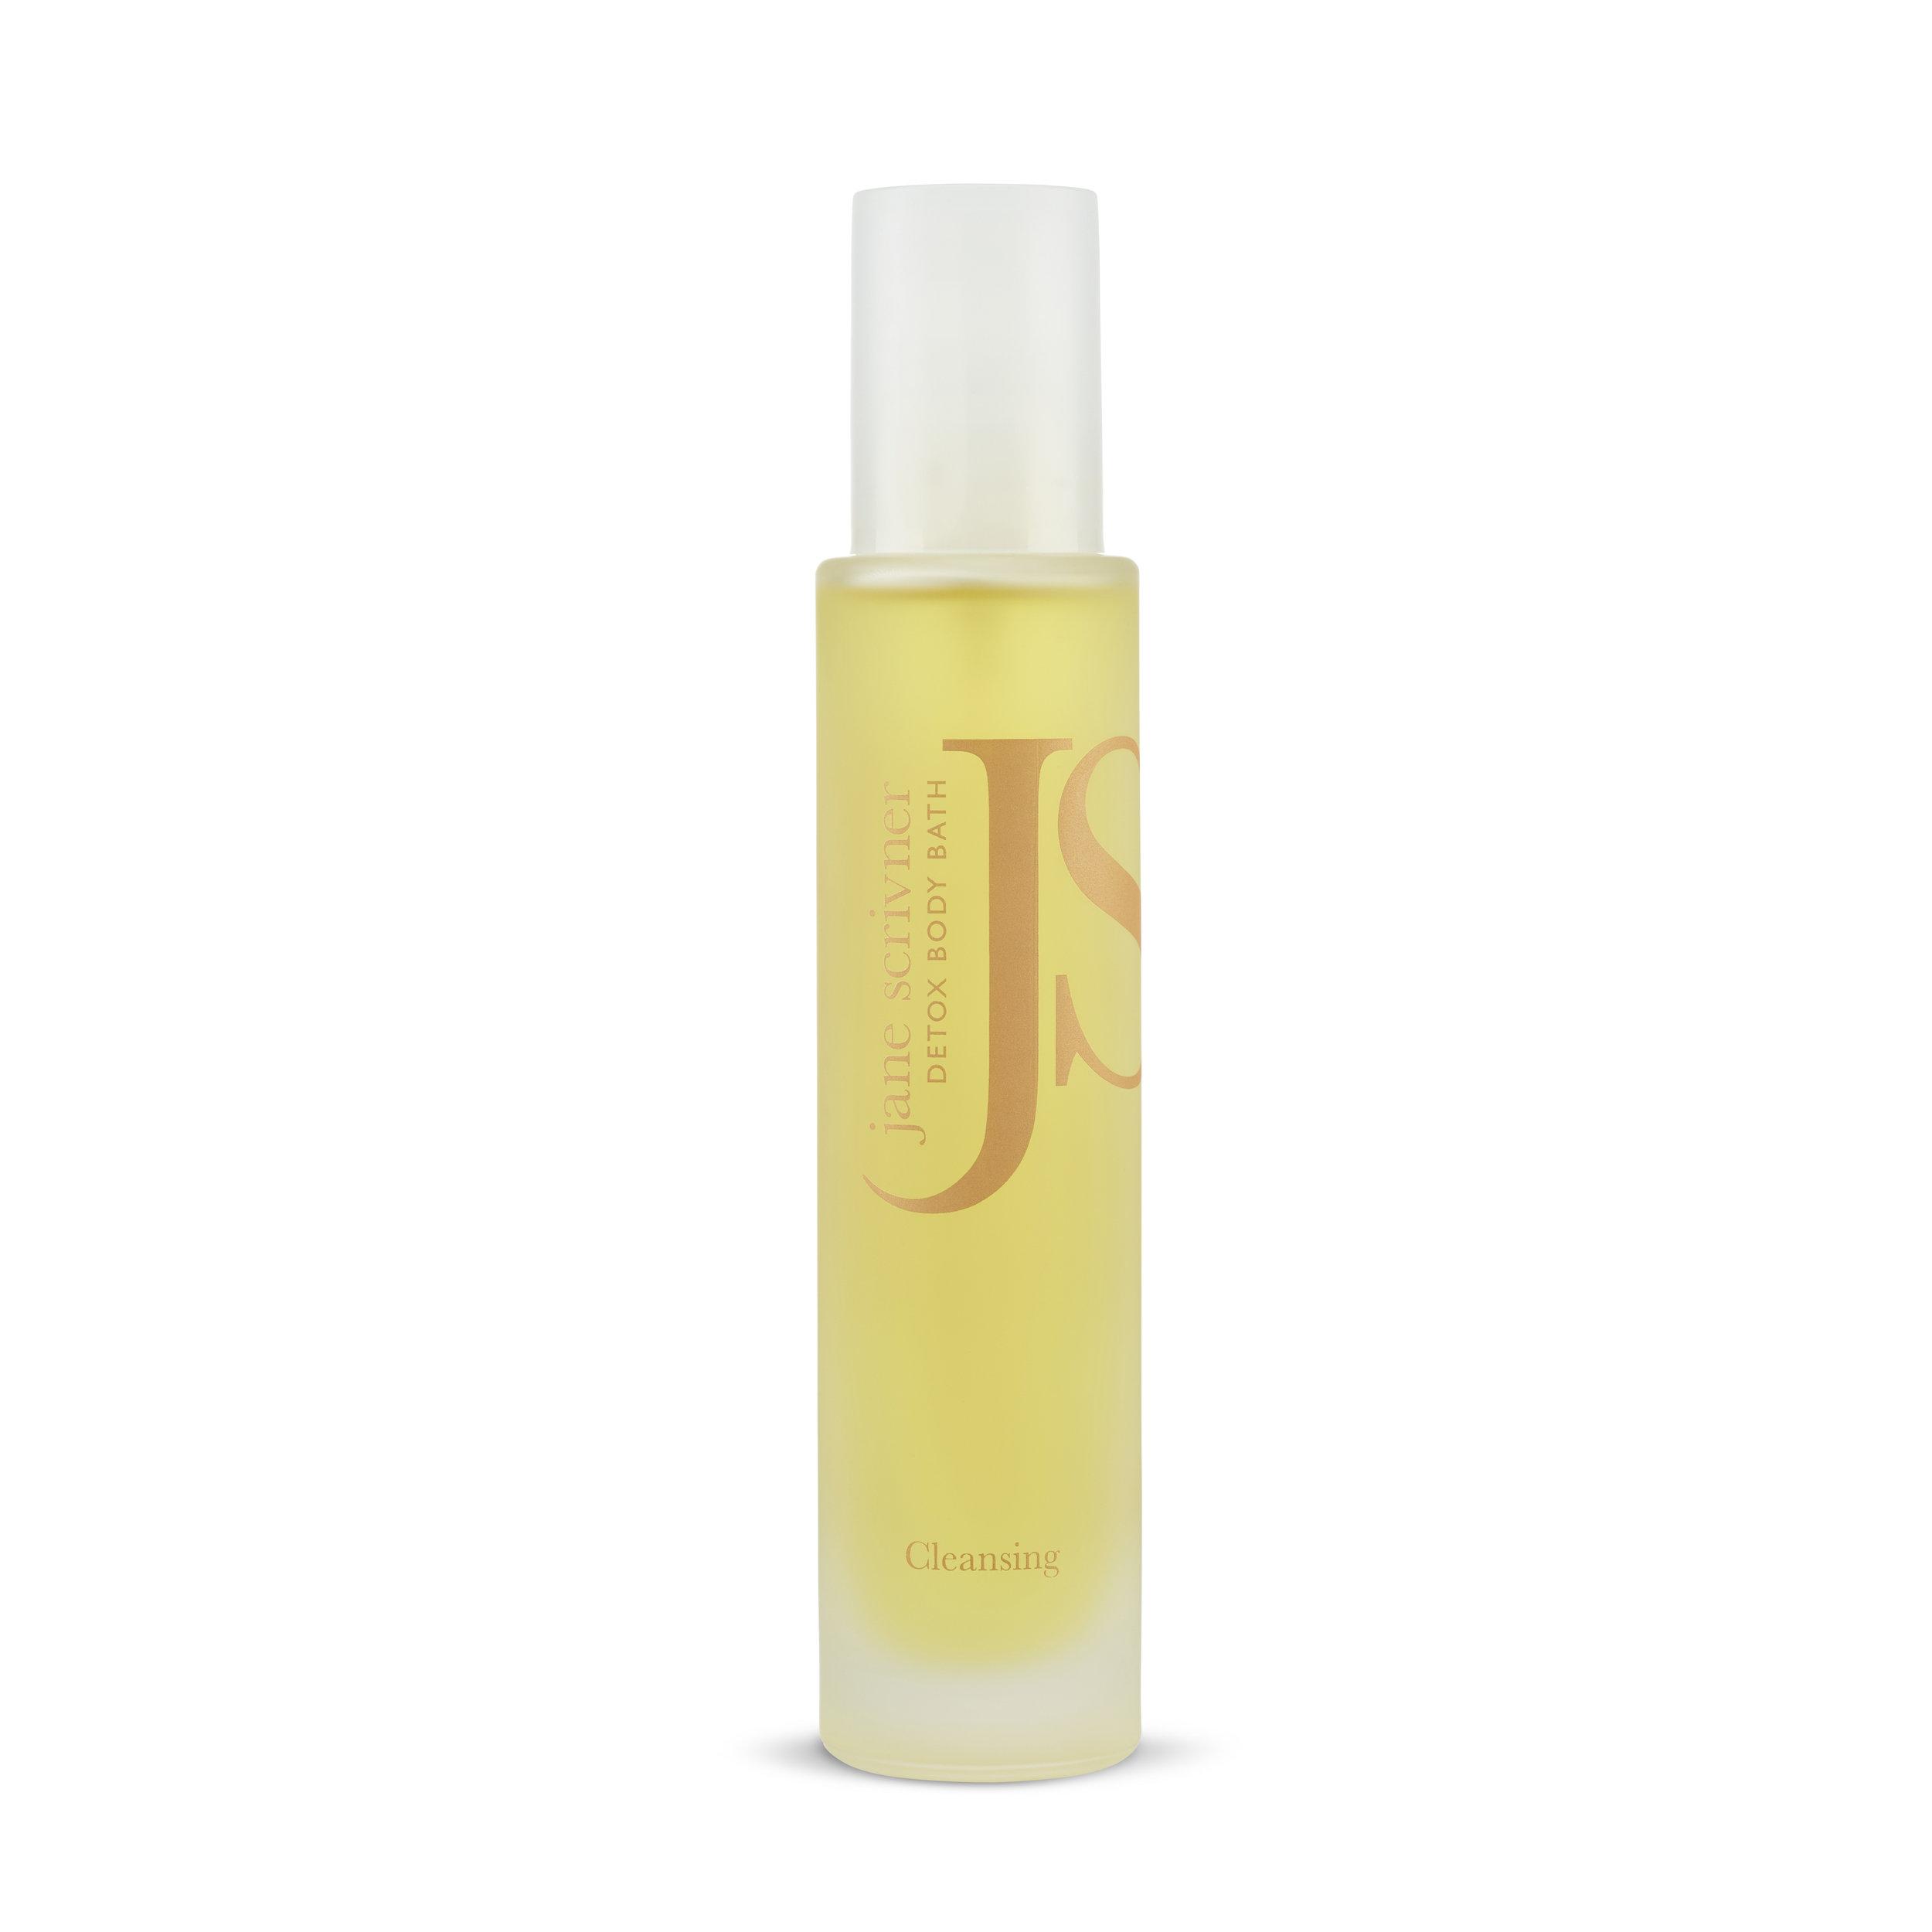 DETOX Cleansing Body Bath Oil 100ml Bottle with Drop Shadow.jpg